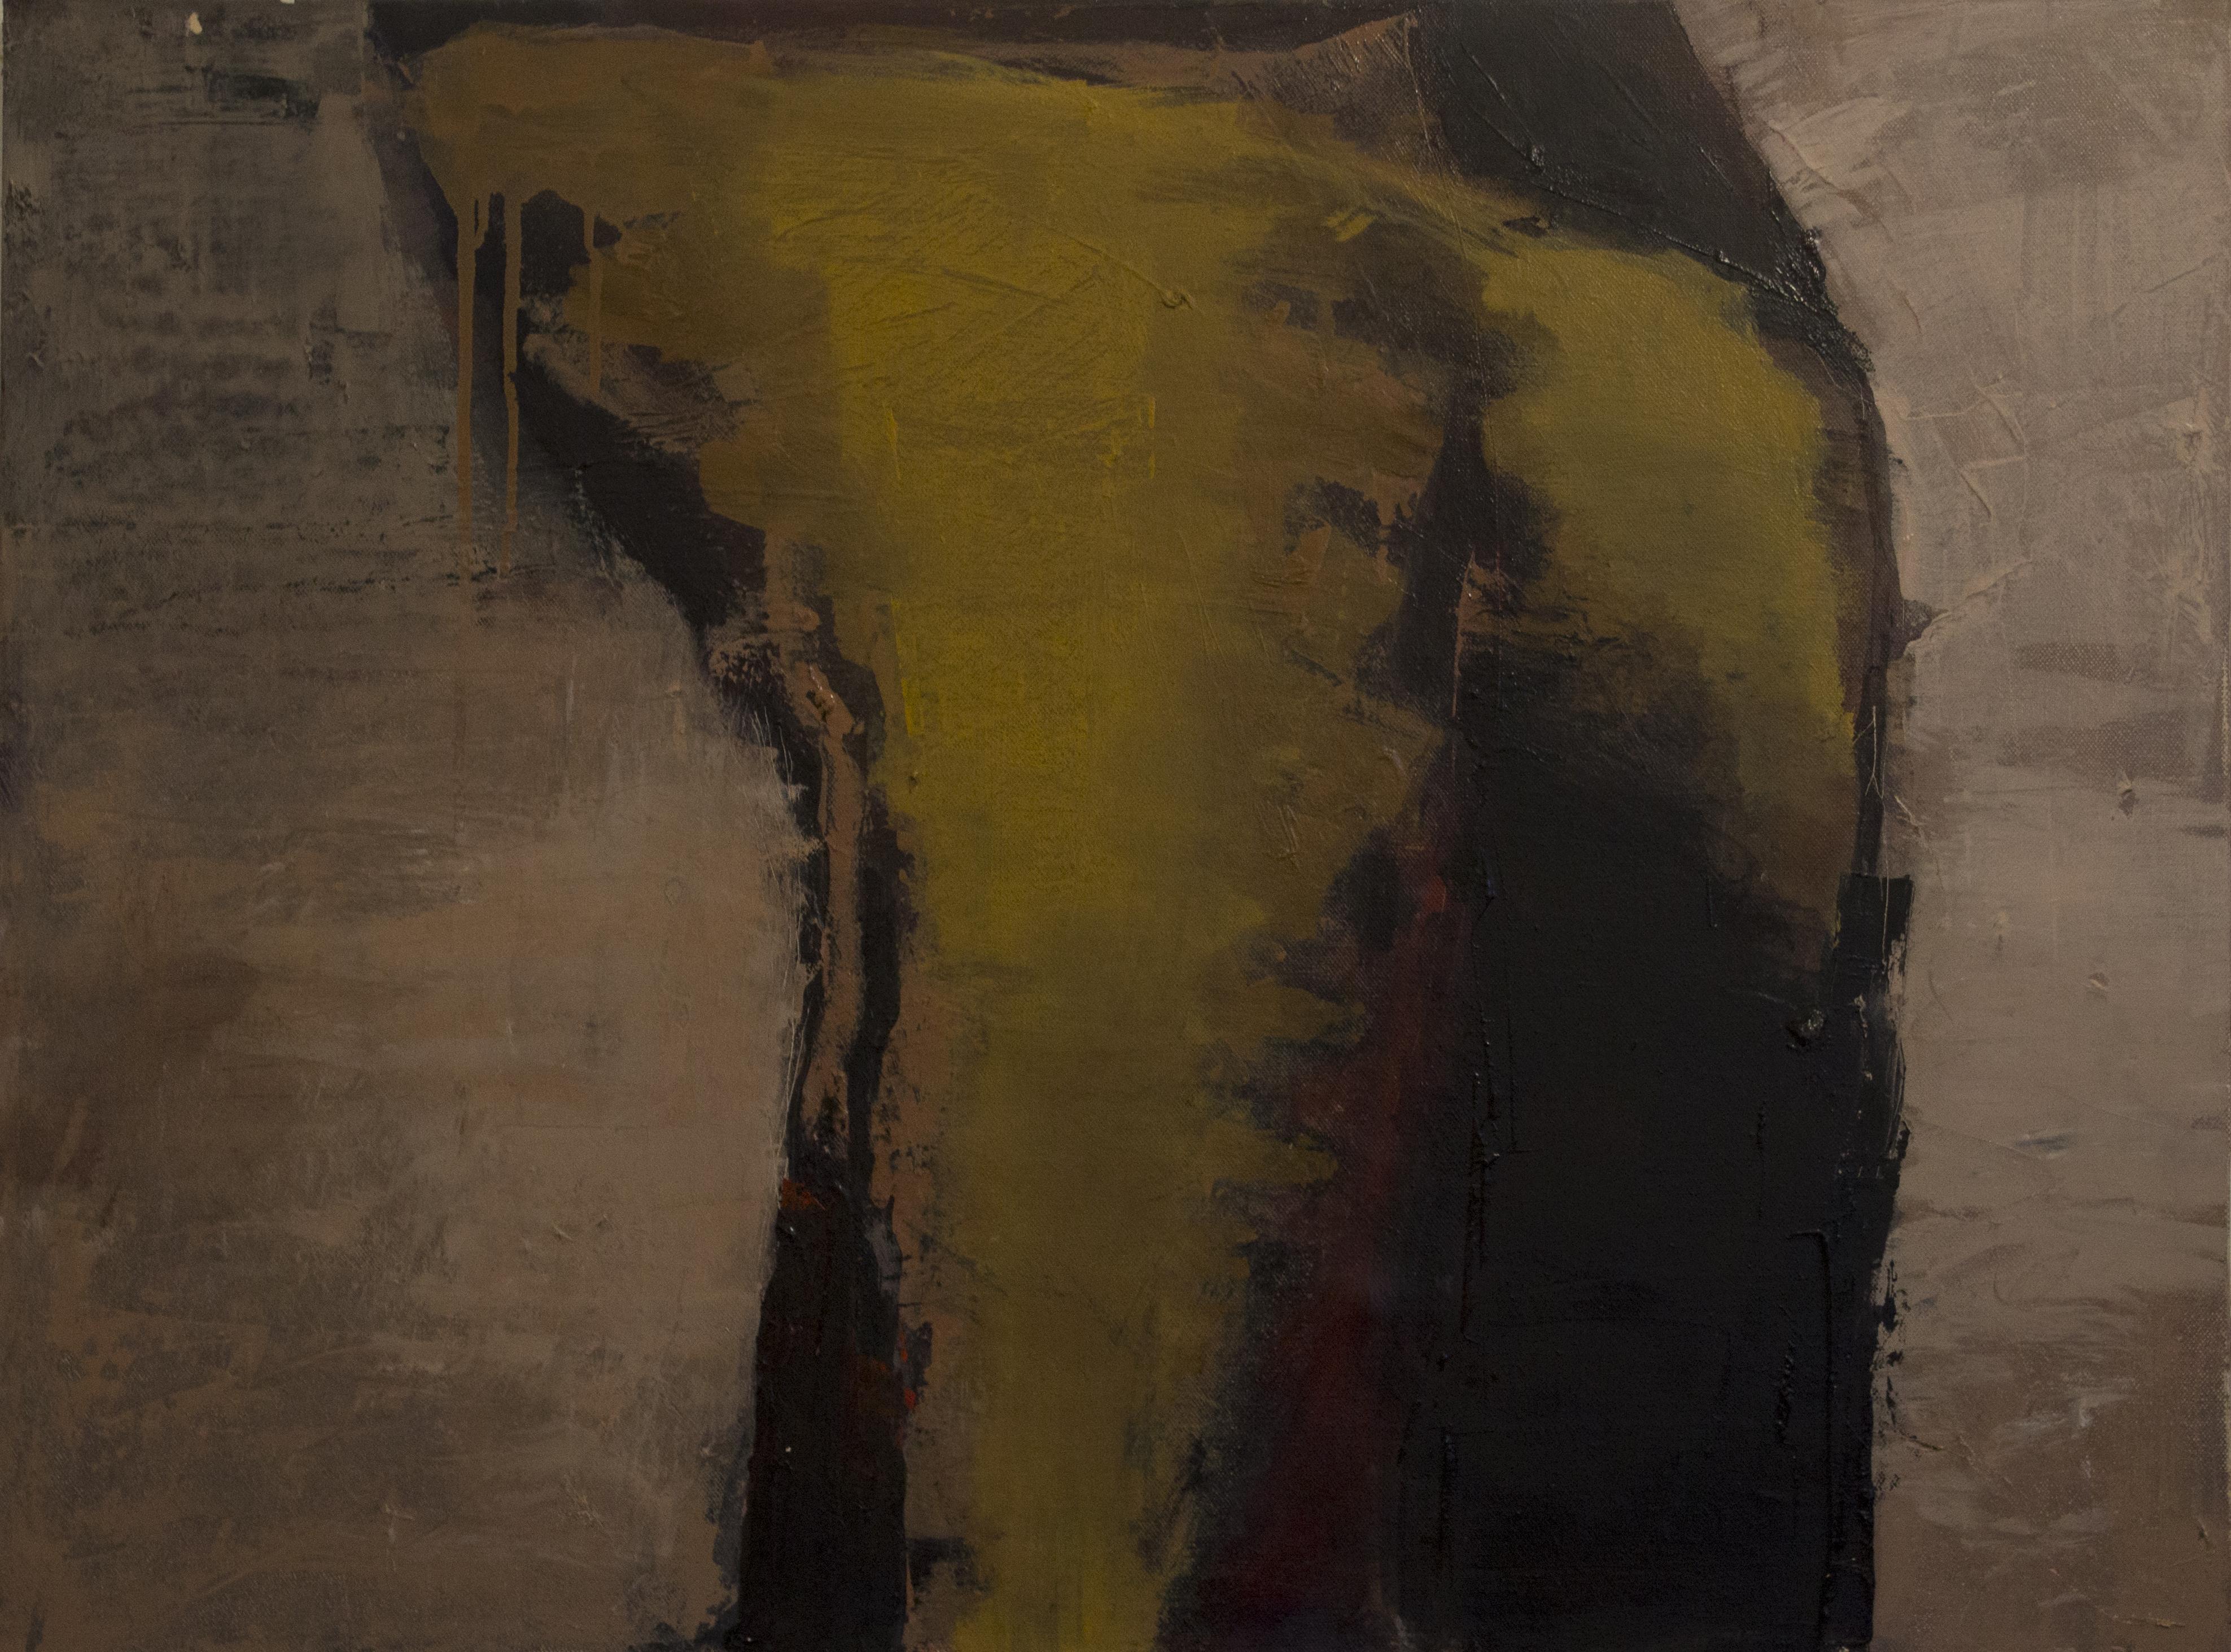 Jules Allan - Ochre and black, 60cm x 80cm, oil on canvas